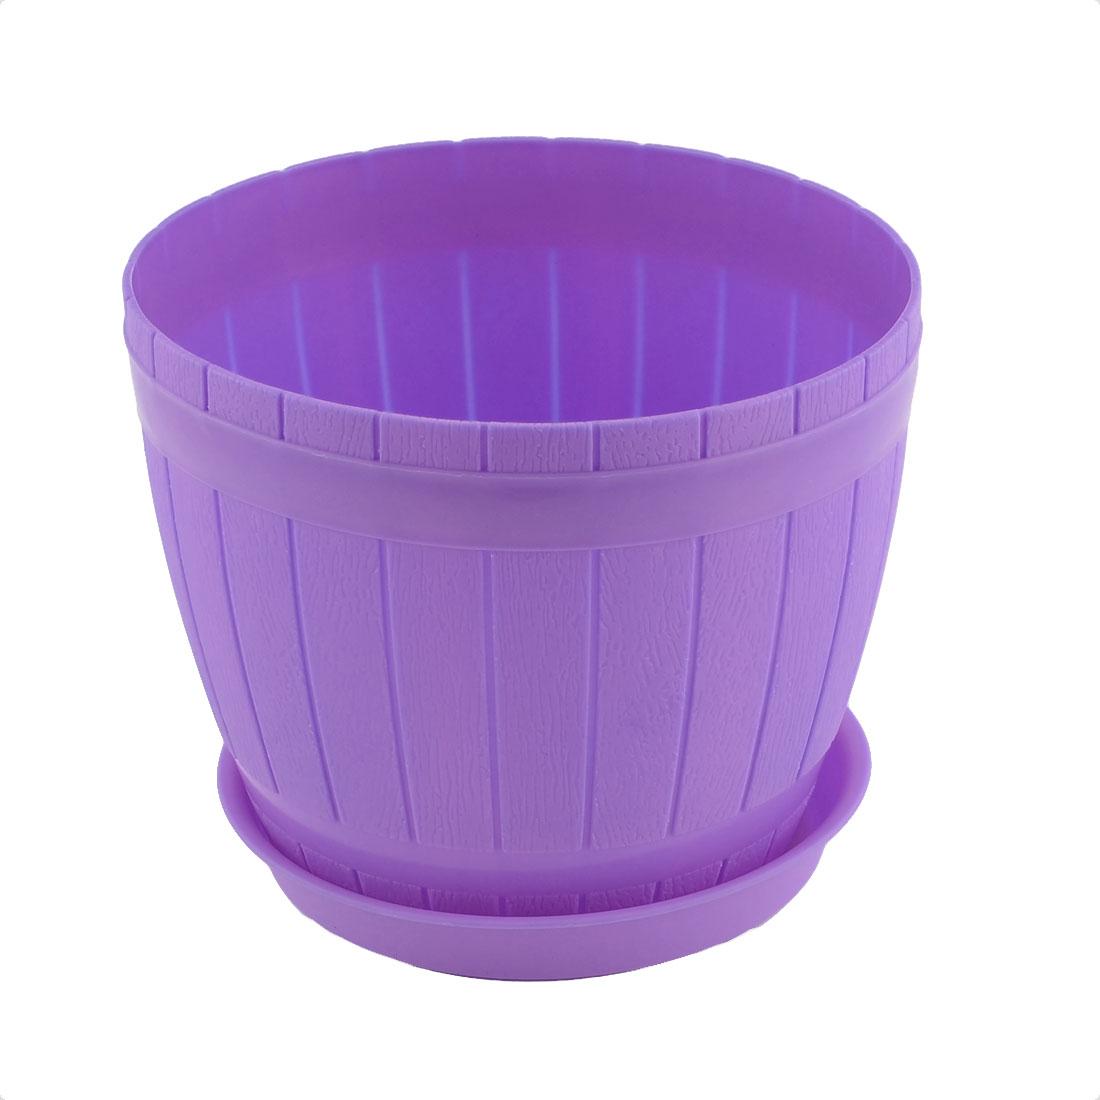 Home Windowsill Hotel Plastic Barrel Shape Plant Flower Pot Holder Purple w Tray